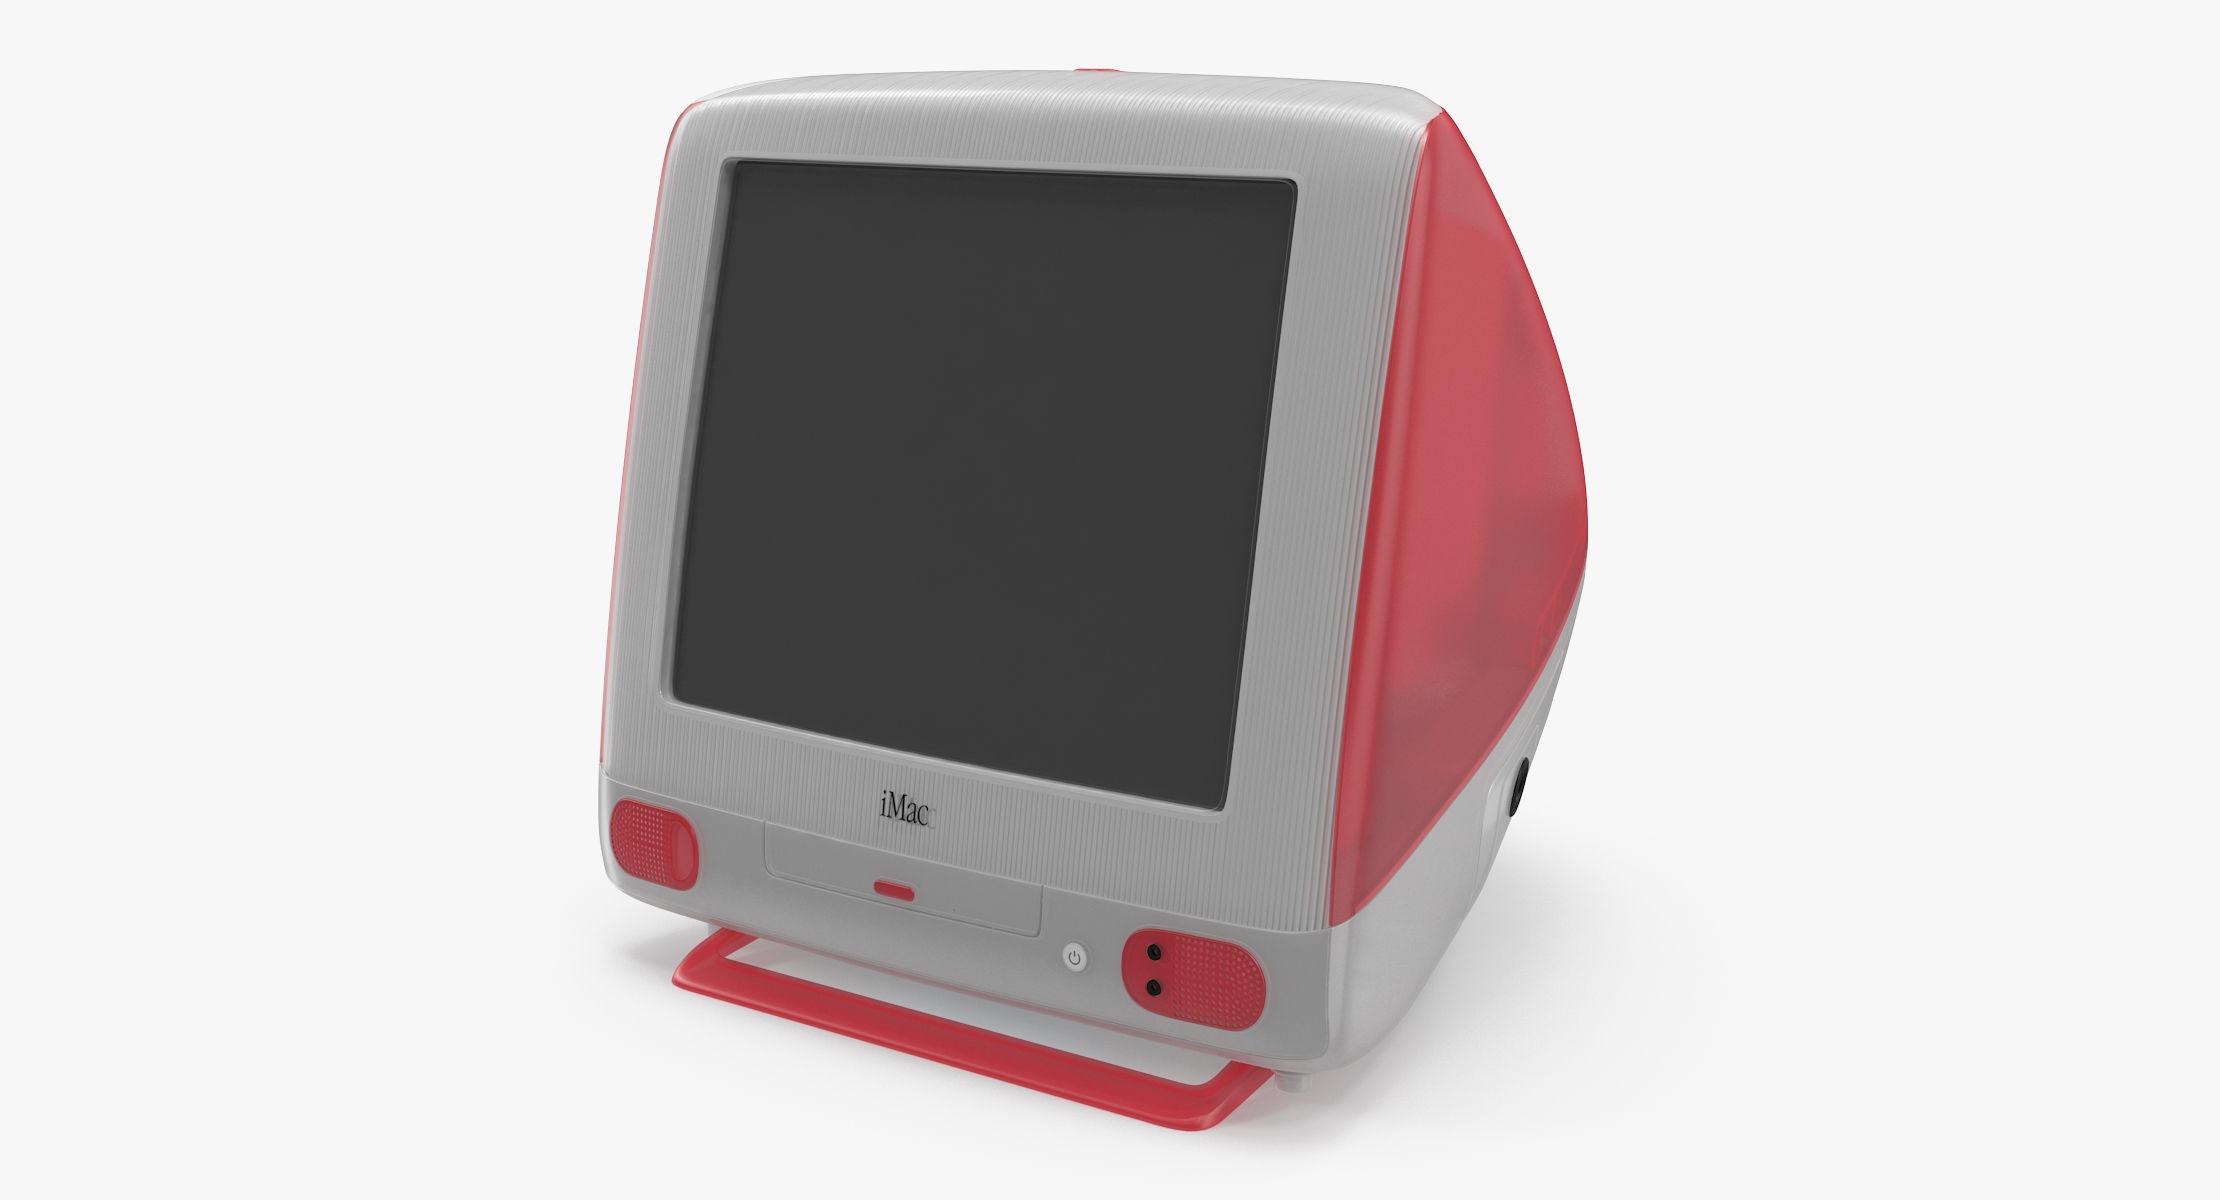 iMac - reel 1